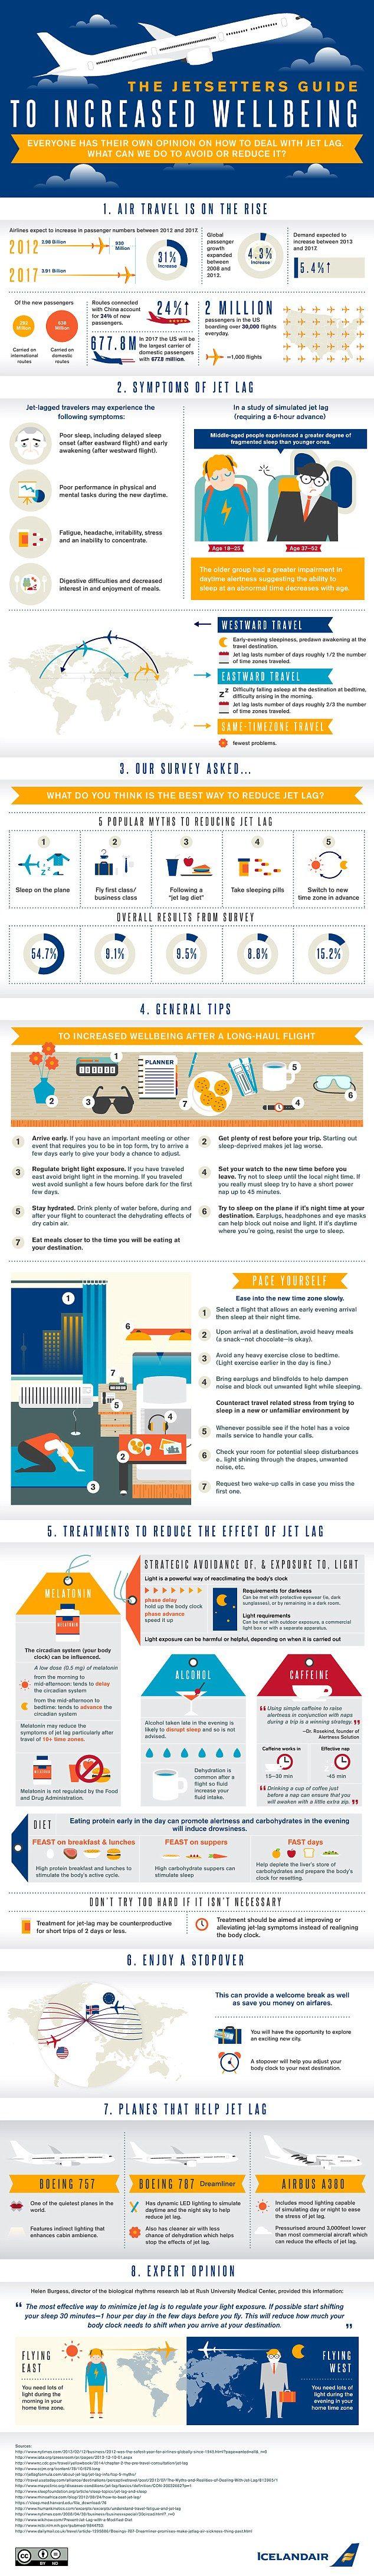 The infographic that advises passengers on how to combat #jetlag. #Travel